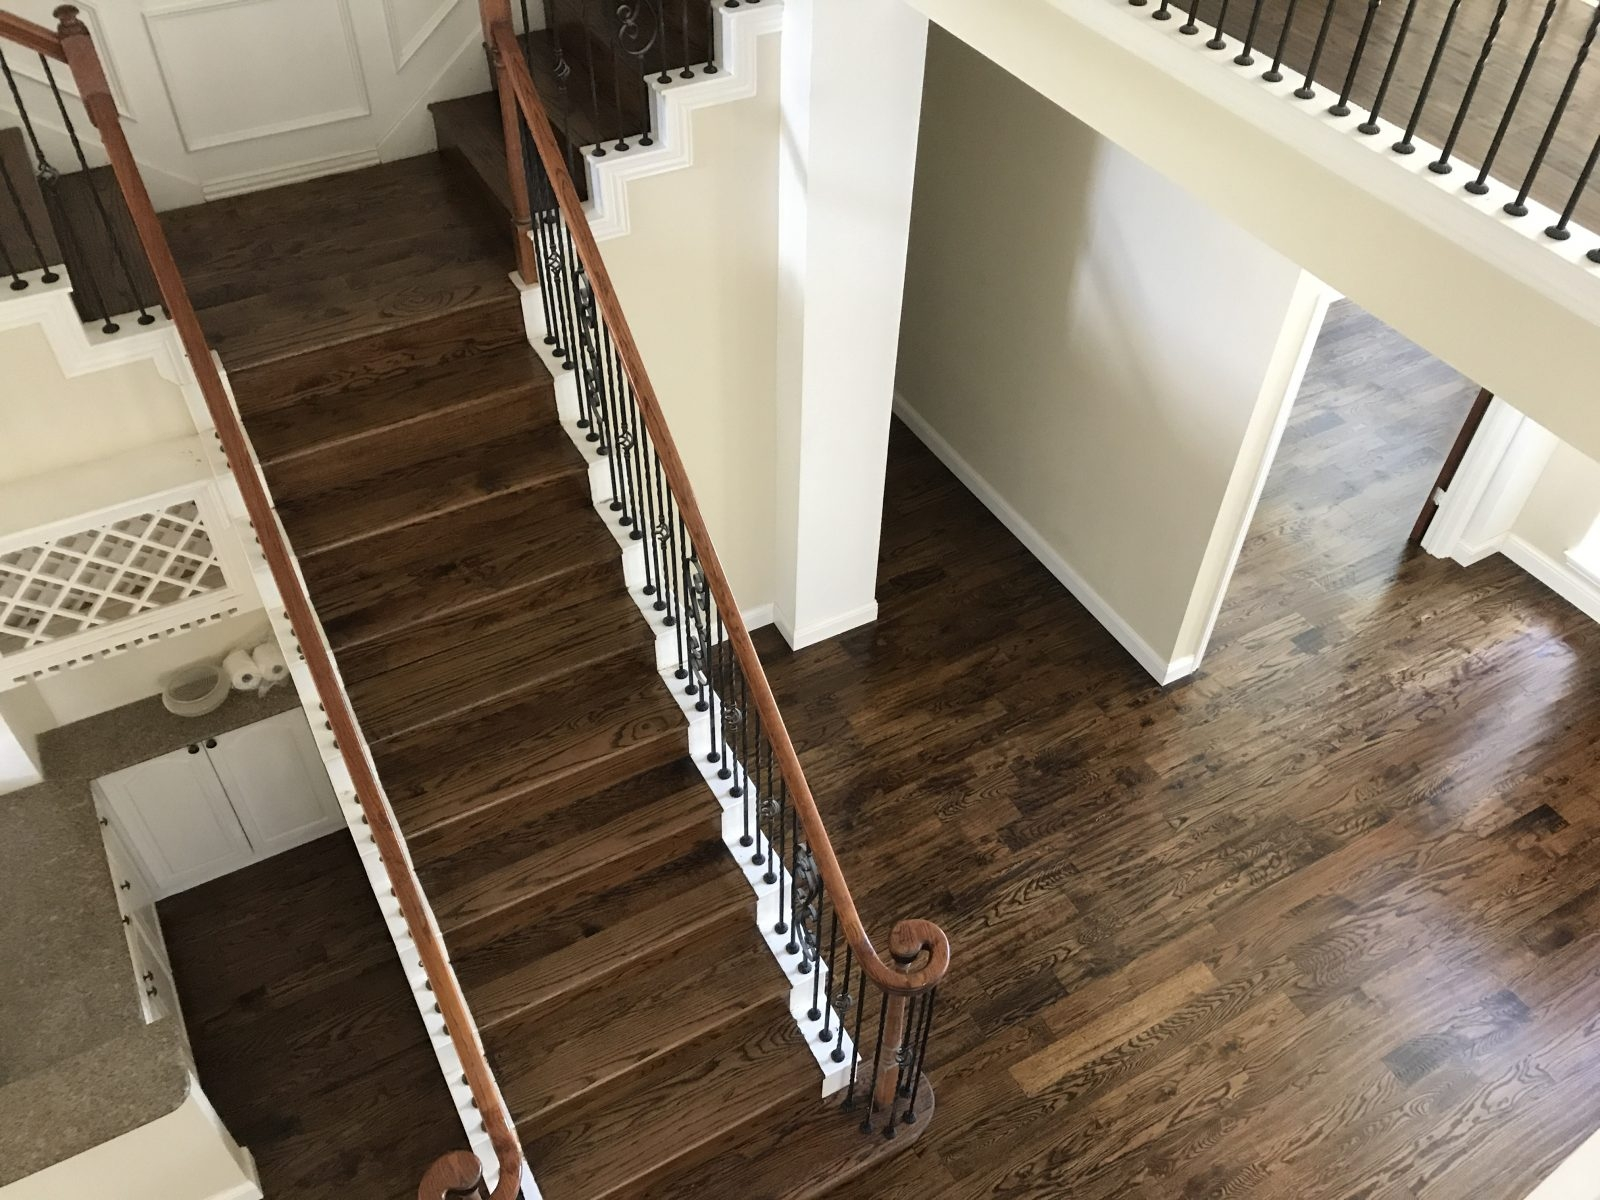 Installing Hardwood Floor In Plano Tx 3 Gc Flooring Pros | Installing Wood Floors On Stairs | Stair Tread | Stair Nosing | Carpeted Stairs | Vinyl Plank | Carpet